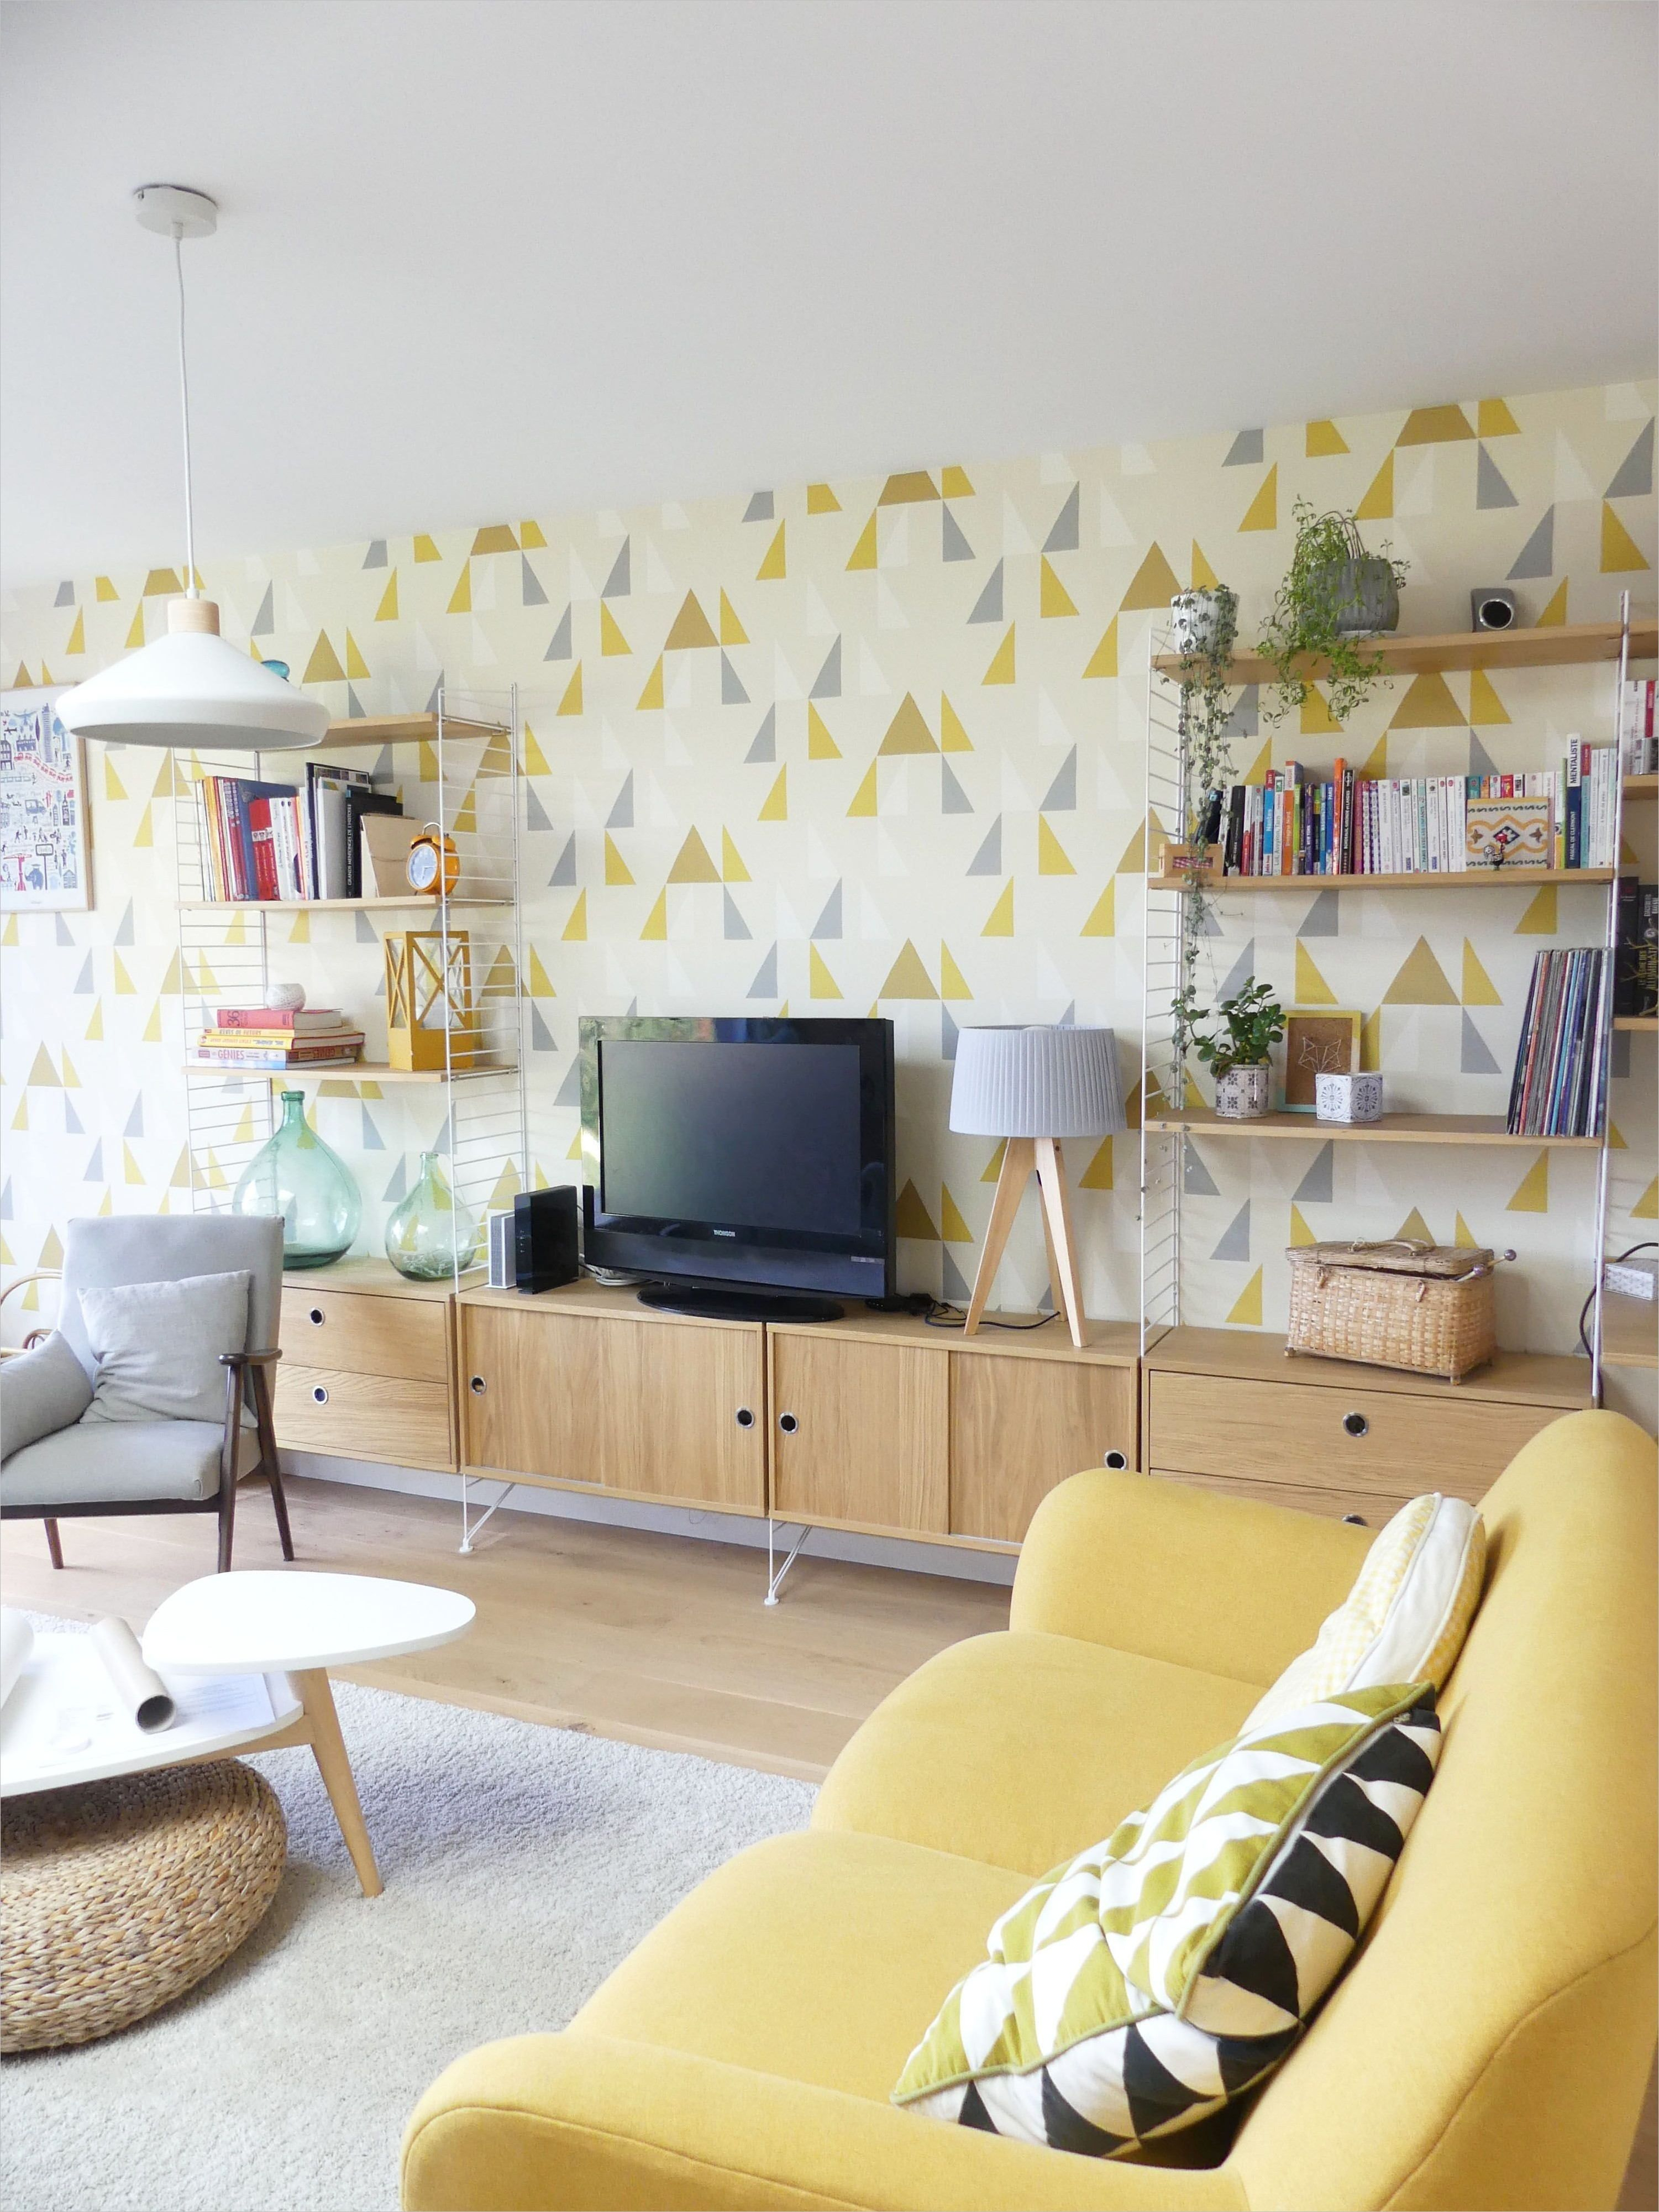 Idee Tapisserie Salle A Manger idee deco tapisserie salle a manger cocoon | décoration